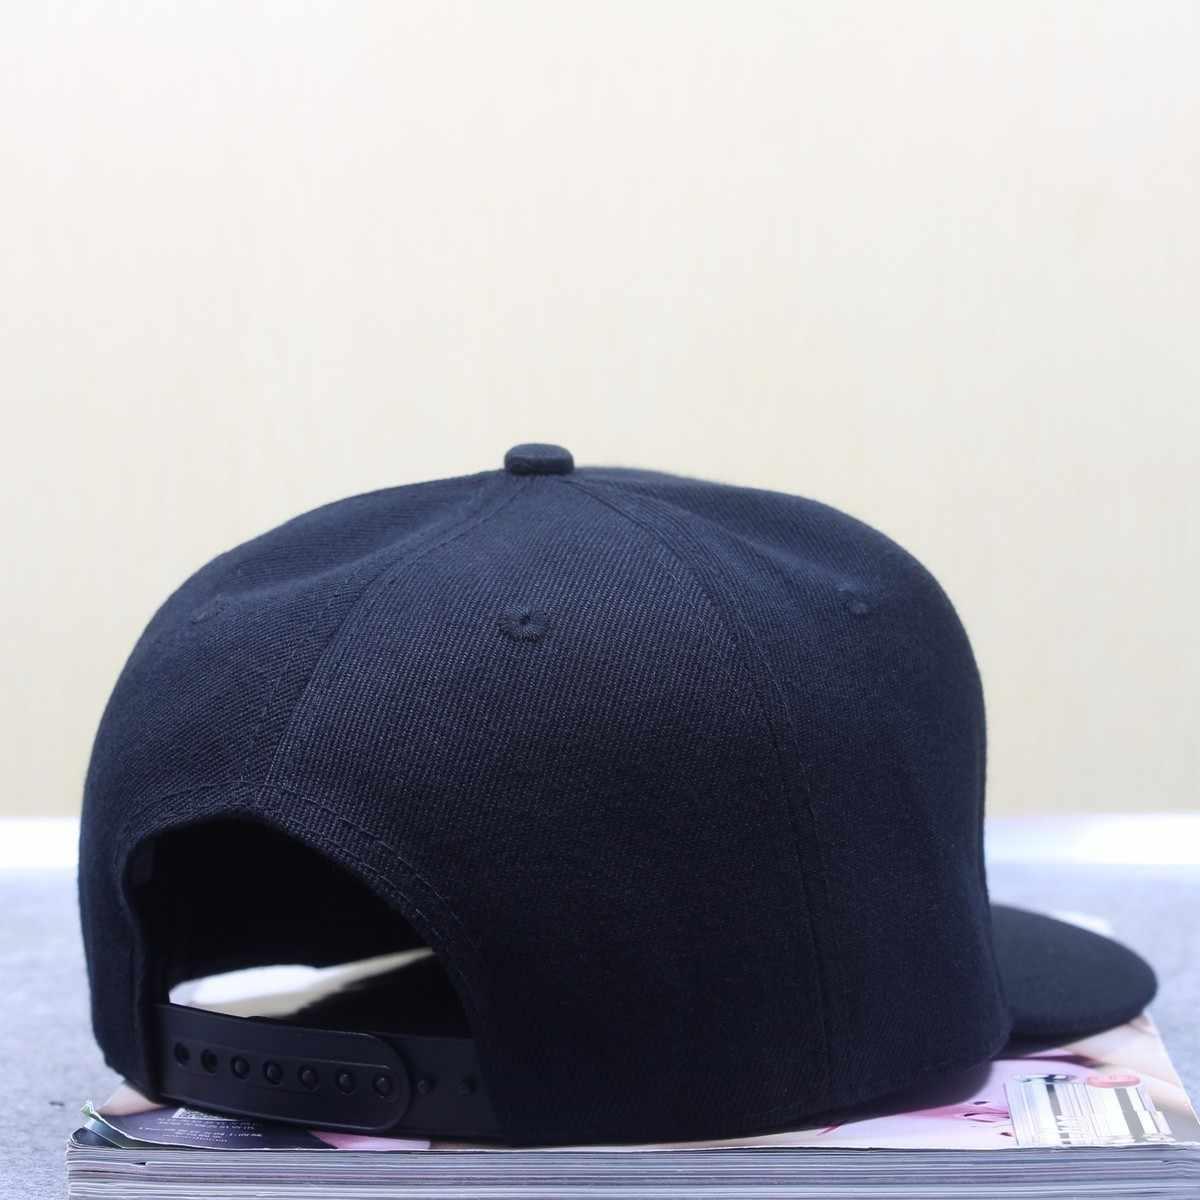 b397fae40 Fashion Neymar NJR Baseball Caps MESSI Snapback Hats Man Women Cotton Hip  Hop Hat Gorras Casual Ronaldo CR7 Casquette NY LA Cap